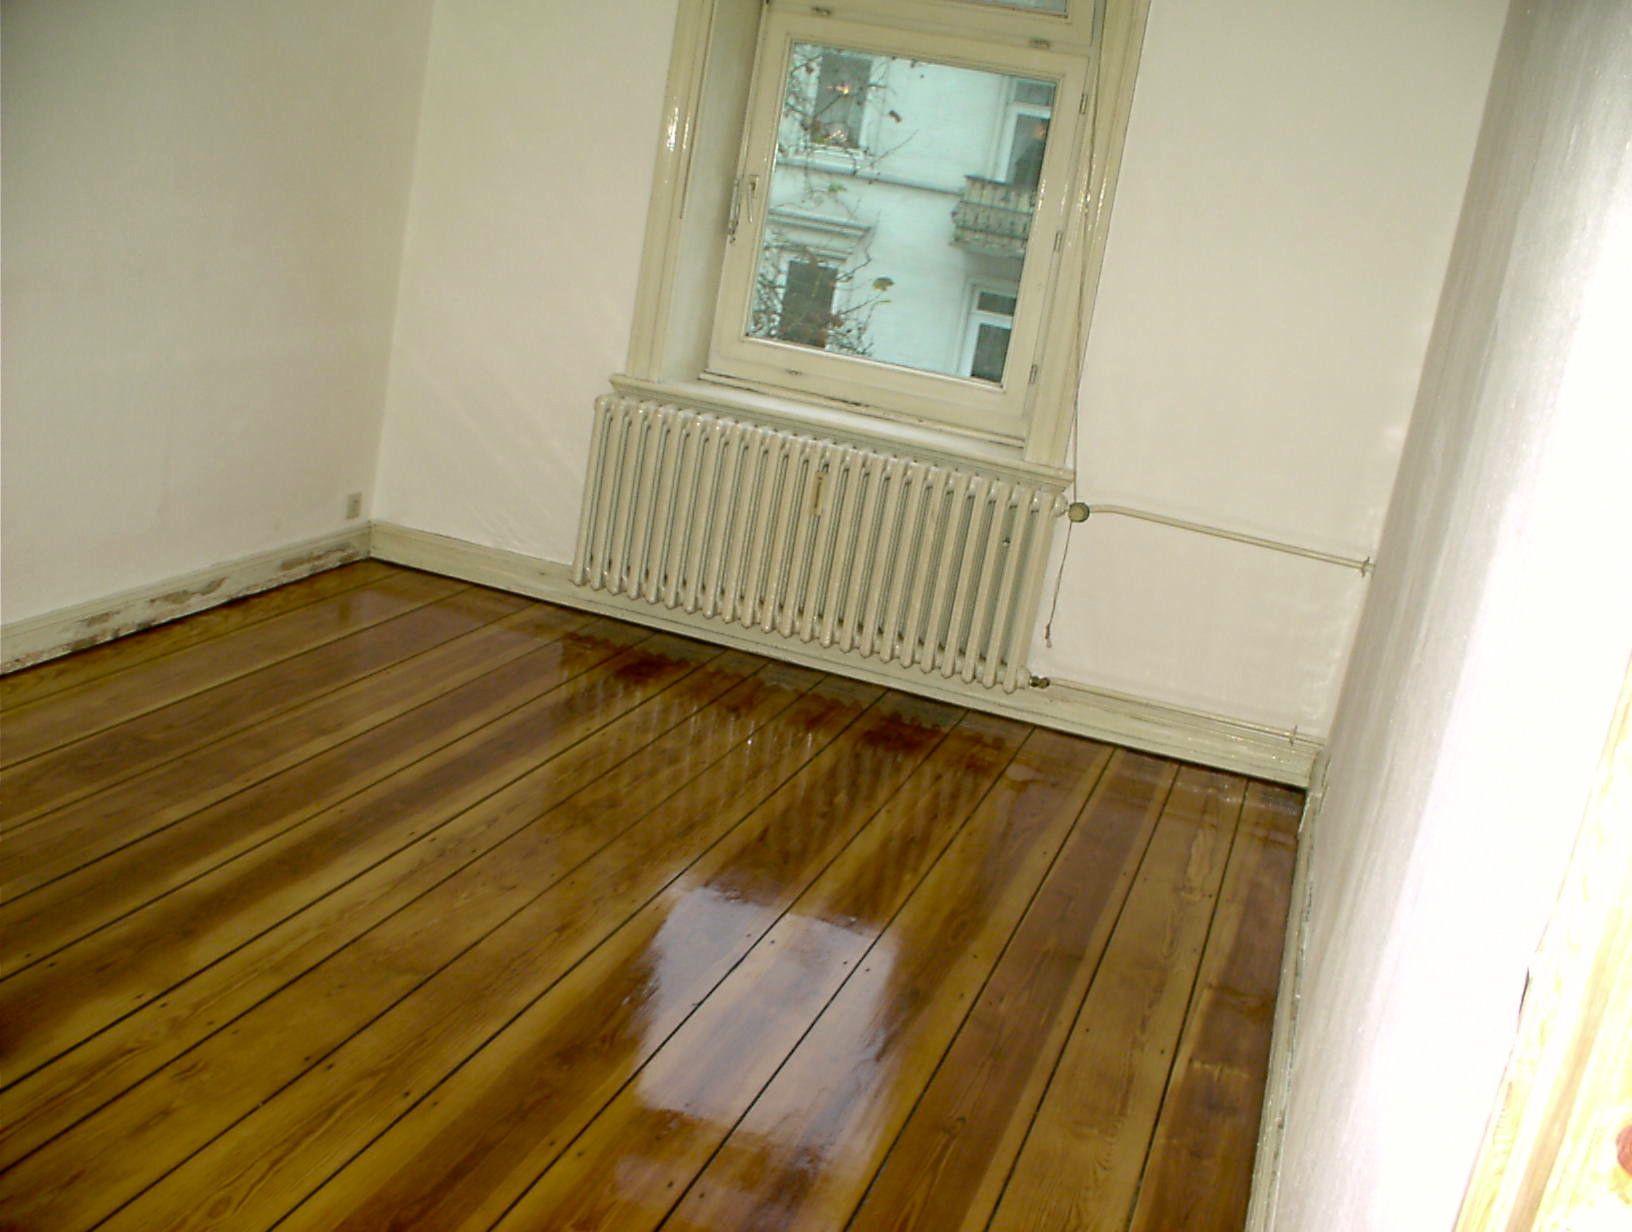 dielen parkett schleifen verlegen berlin parkettschleifmaschinen verleih mieten leihen berlin. Black Bedroom Furniture Sets. Home Design Ideas